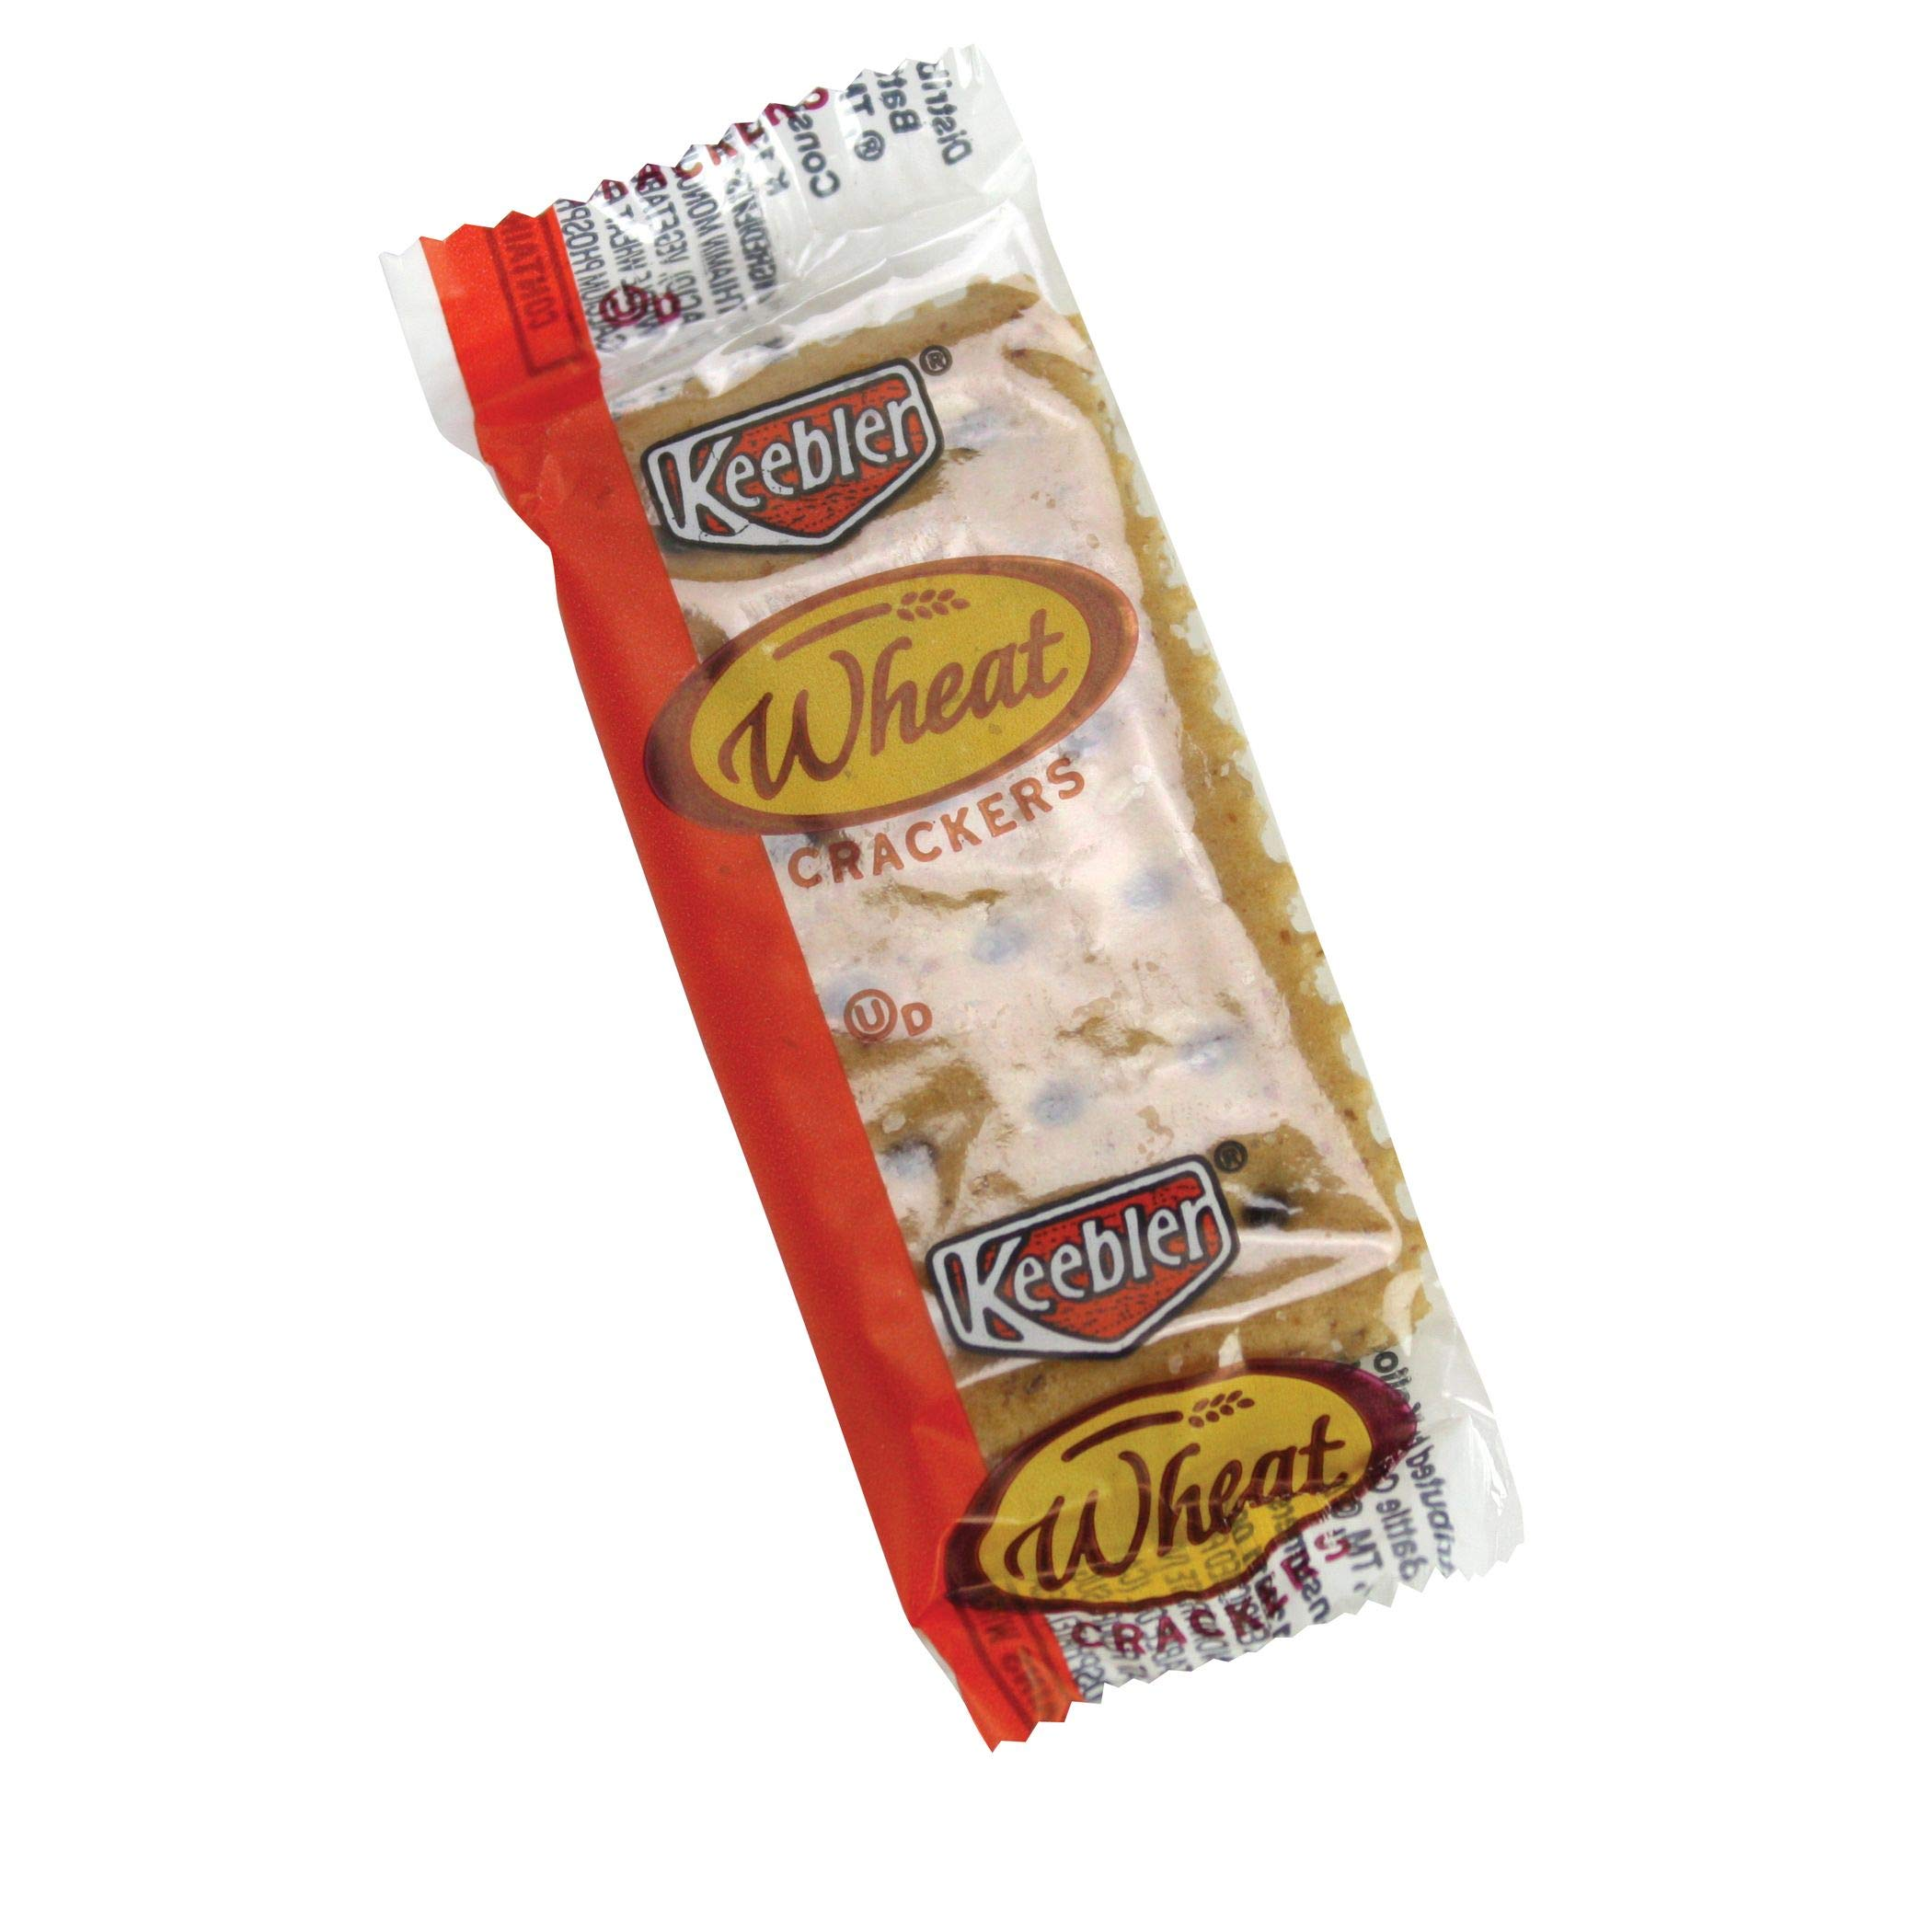 Cracker Keebler Wheat Whole Grain 300 Case 2 Count